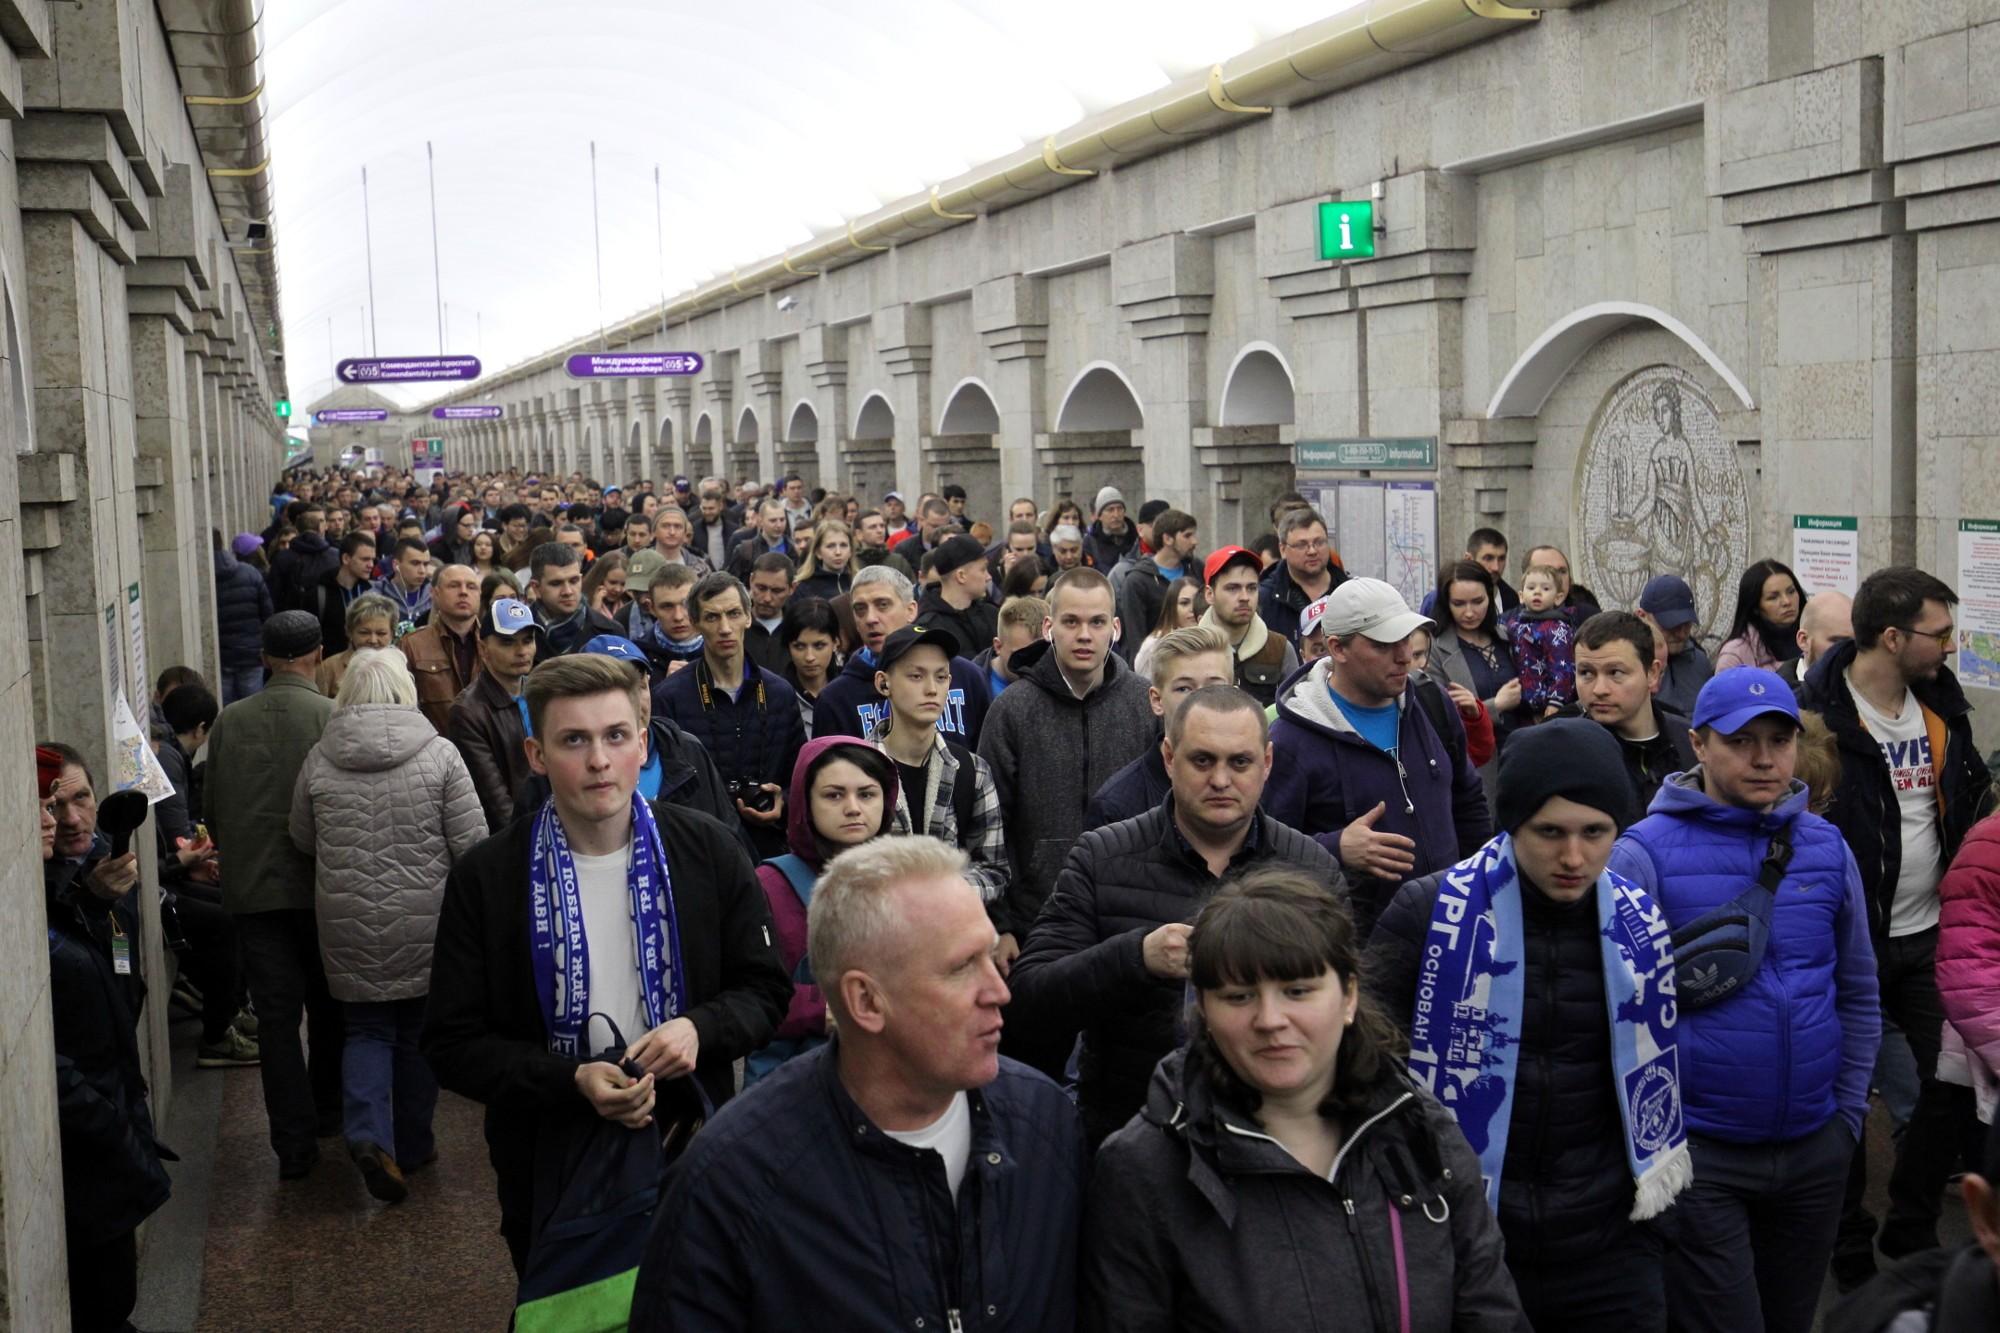 станция метро Крестовский остров фанаты Зенита